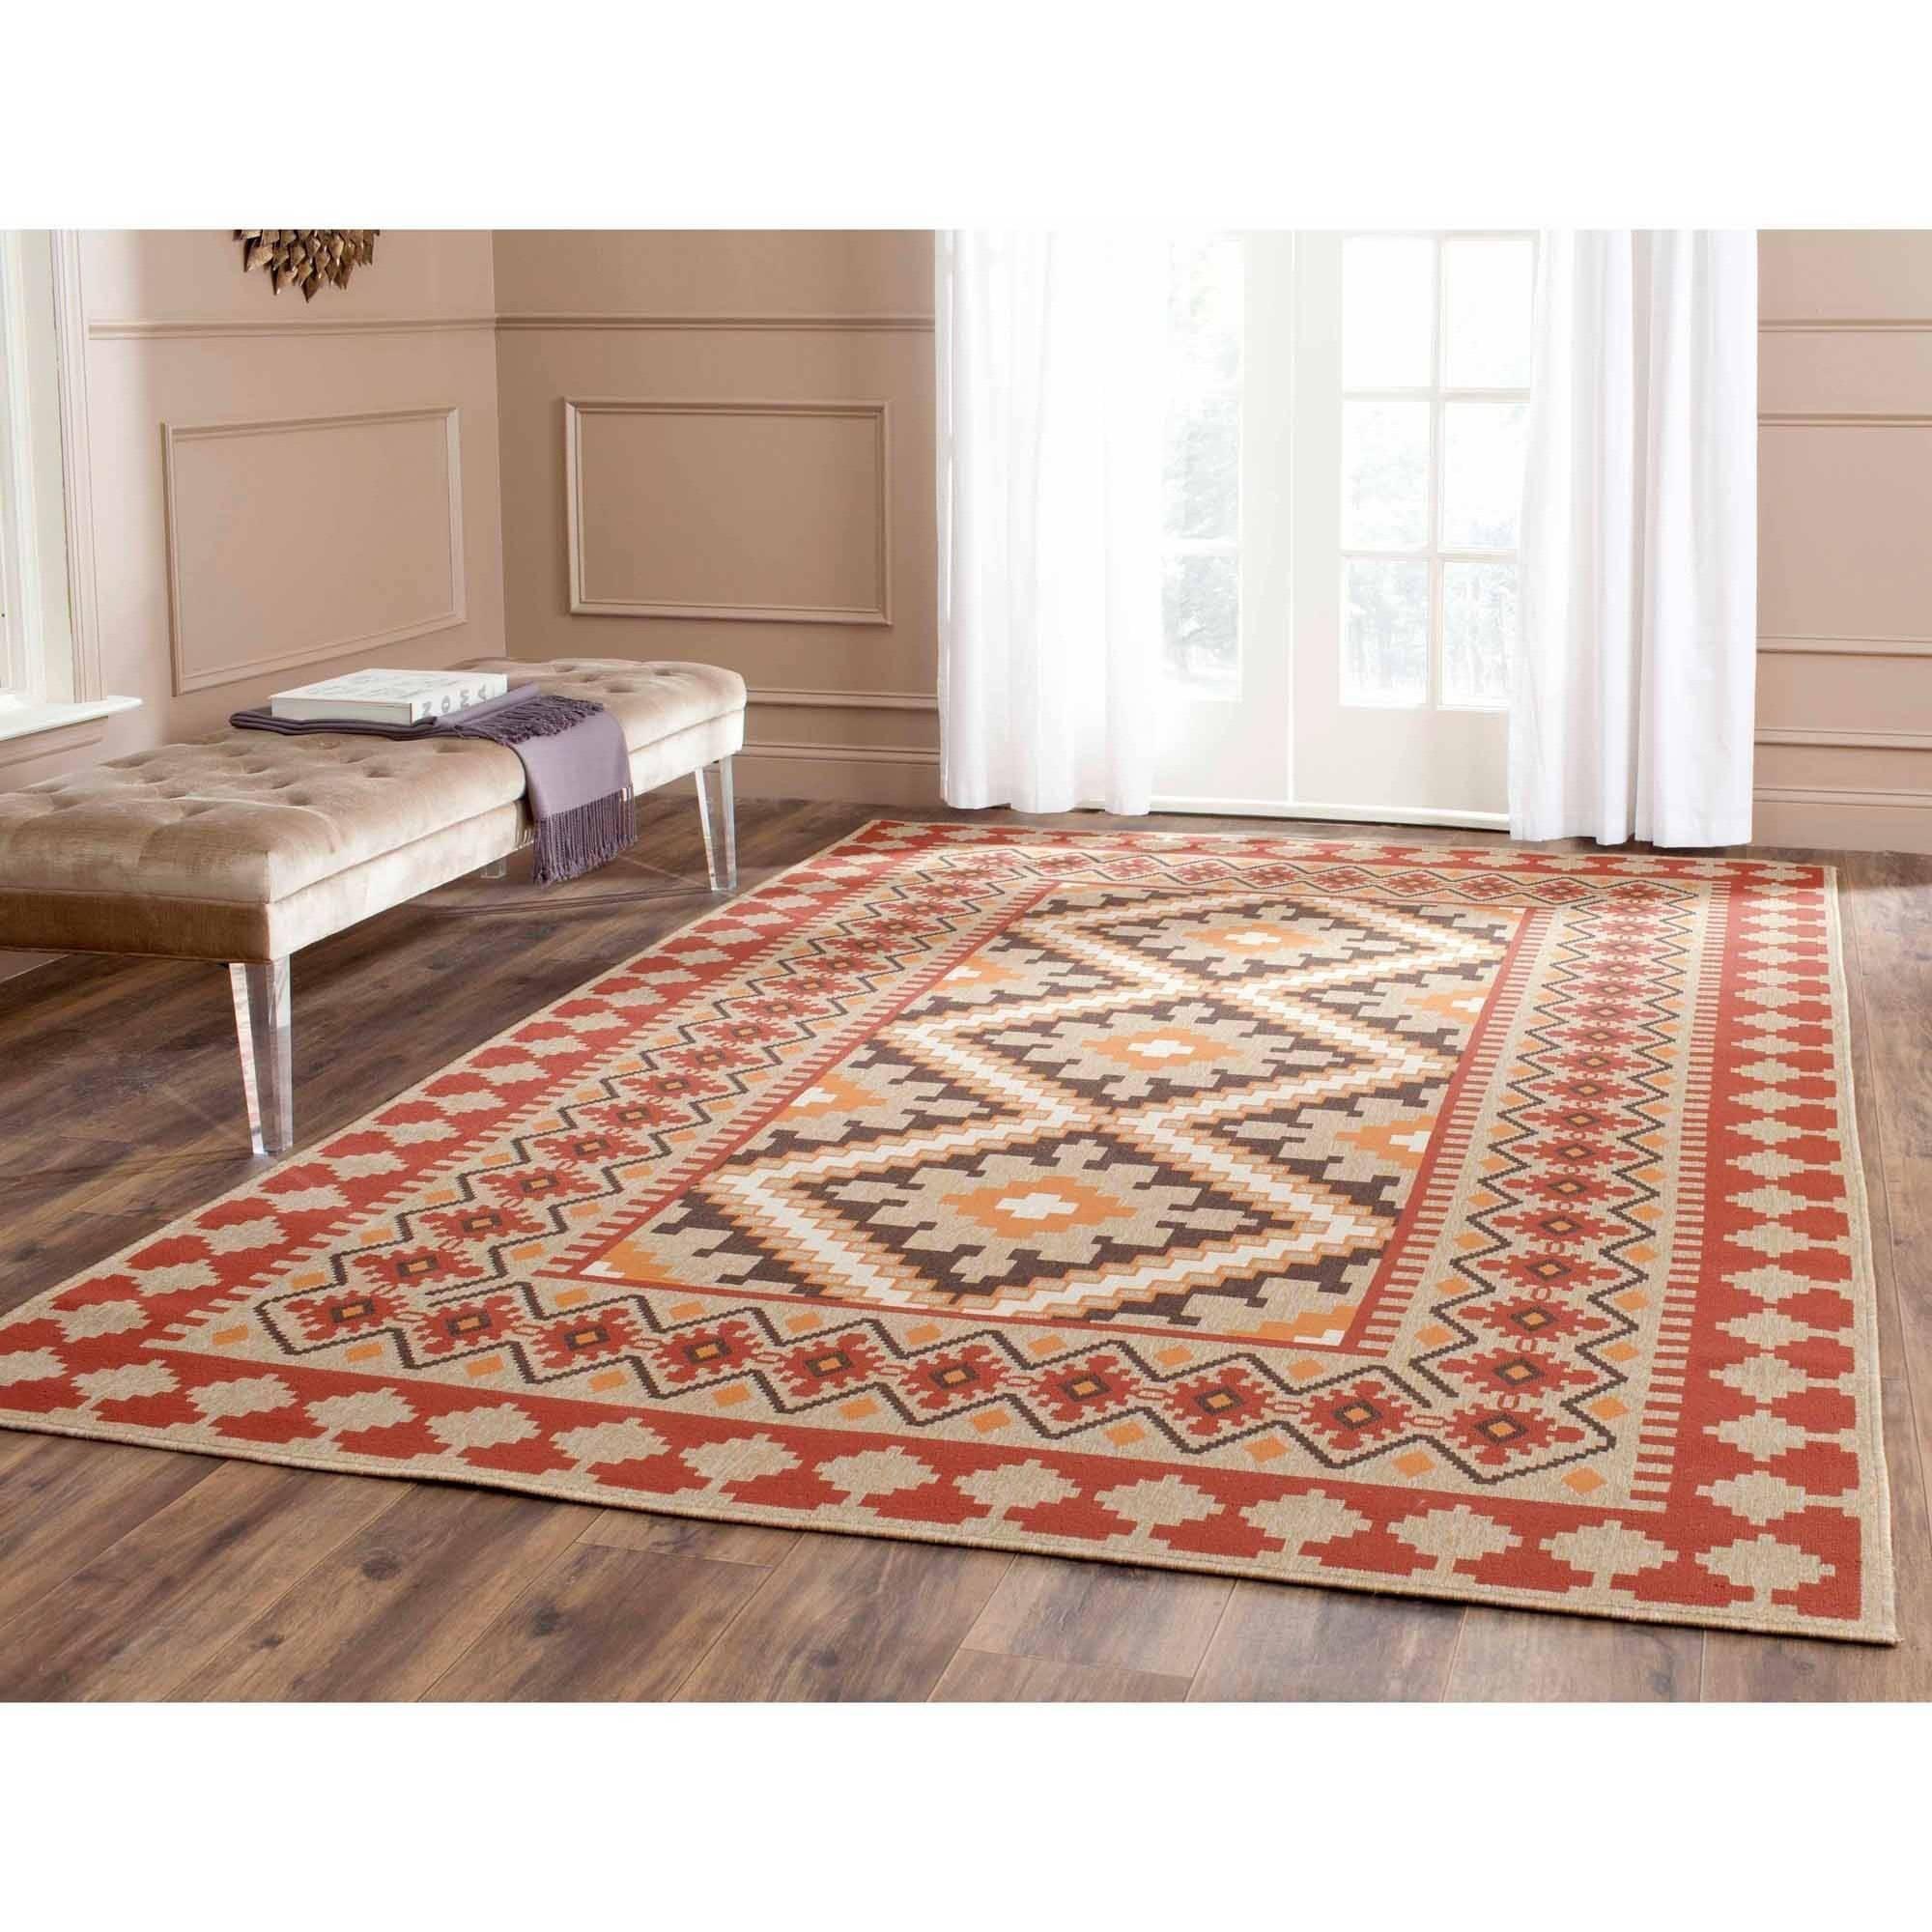 safavieh veranda magna indoor outdoor area rug walmart